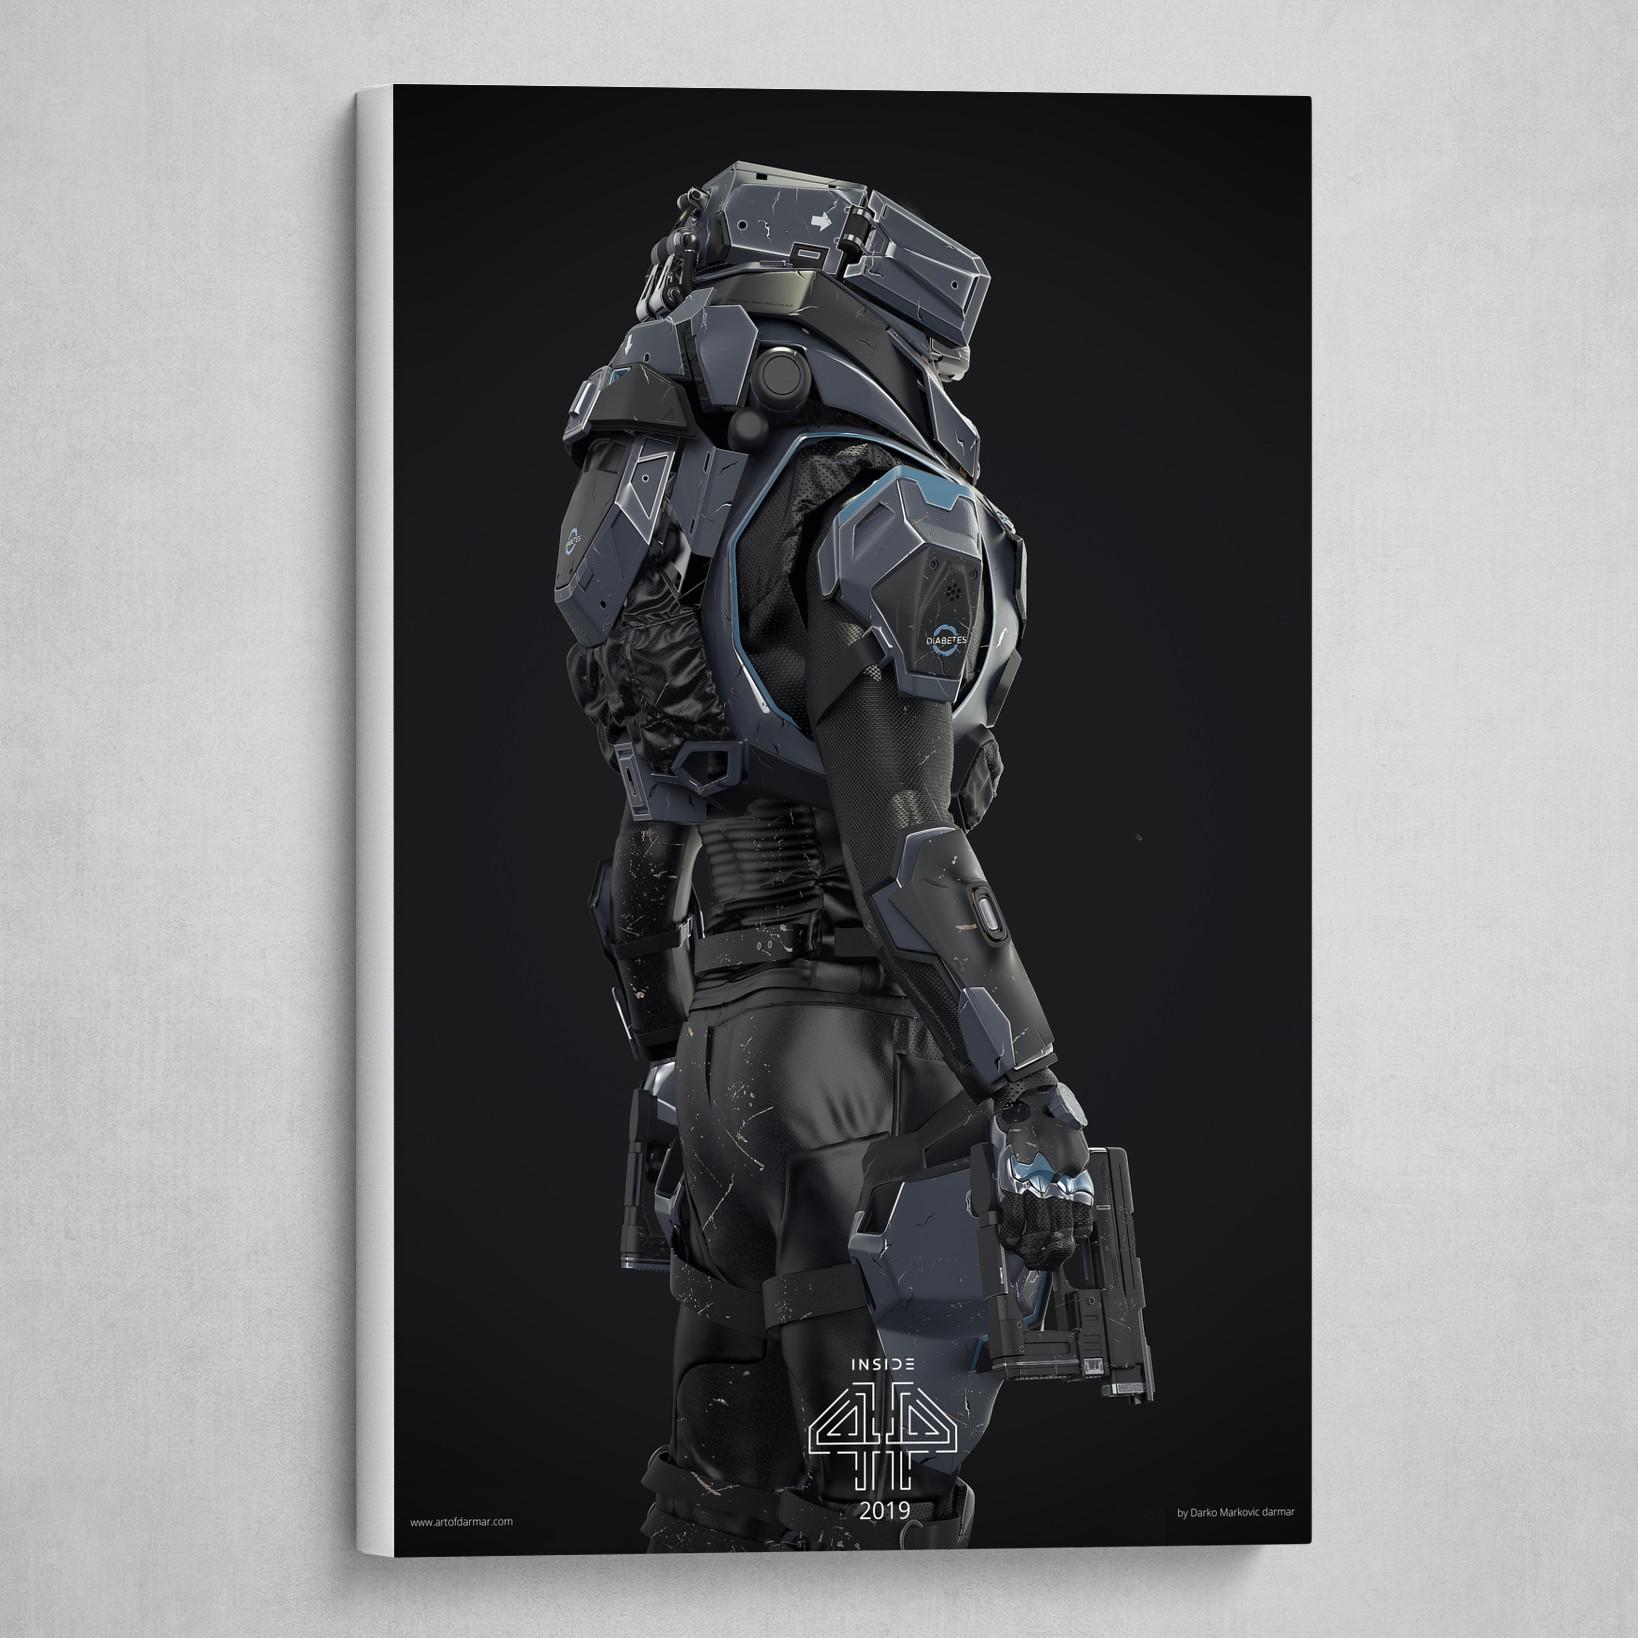 INSIDE 44 - Main Hero print